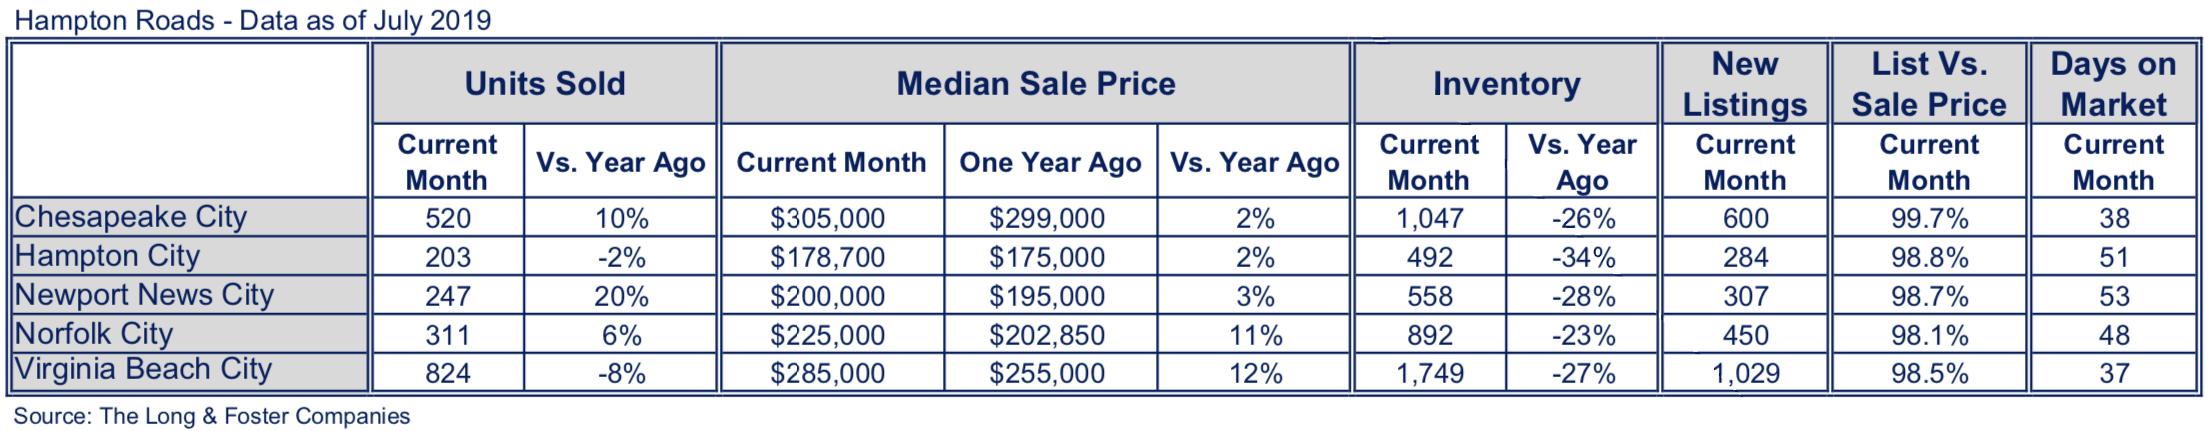 Hampton Roads Market Minute Chart July 2019